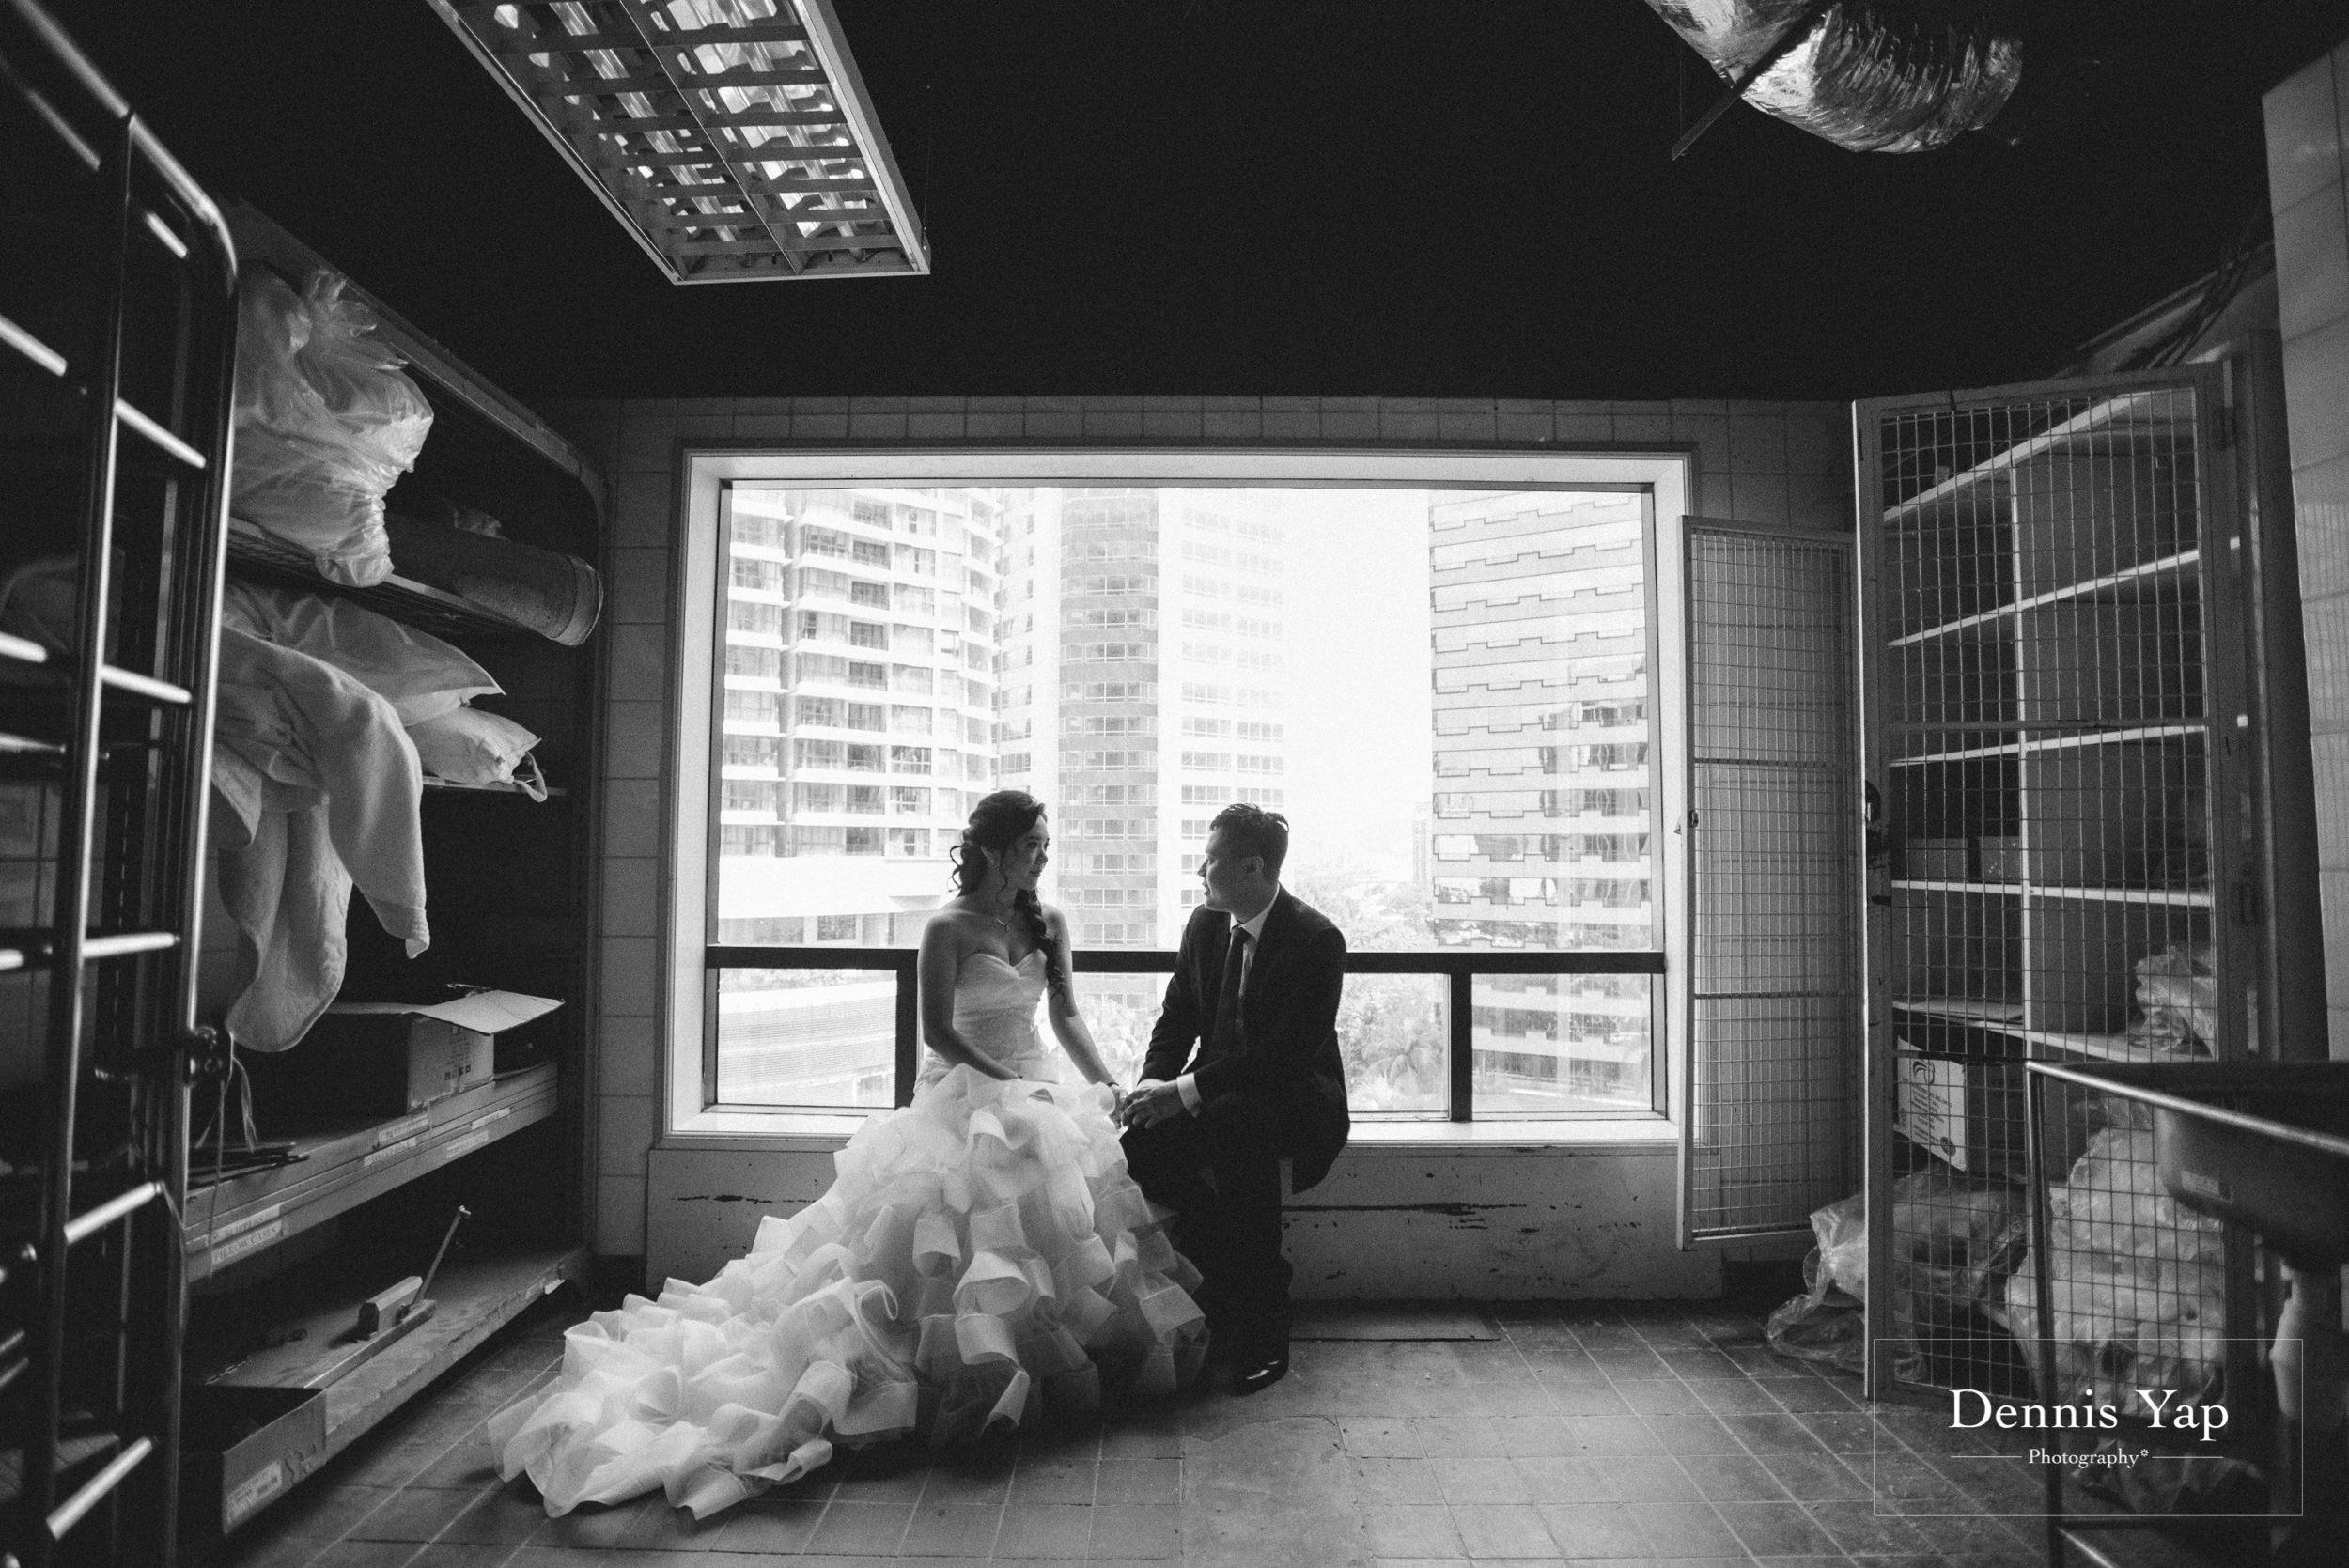 vincent peggy wedding dinner neo tamarind kuala lumpur dennis yap photography-4.jpg